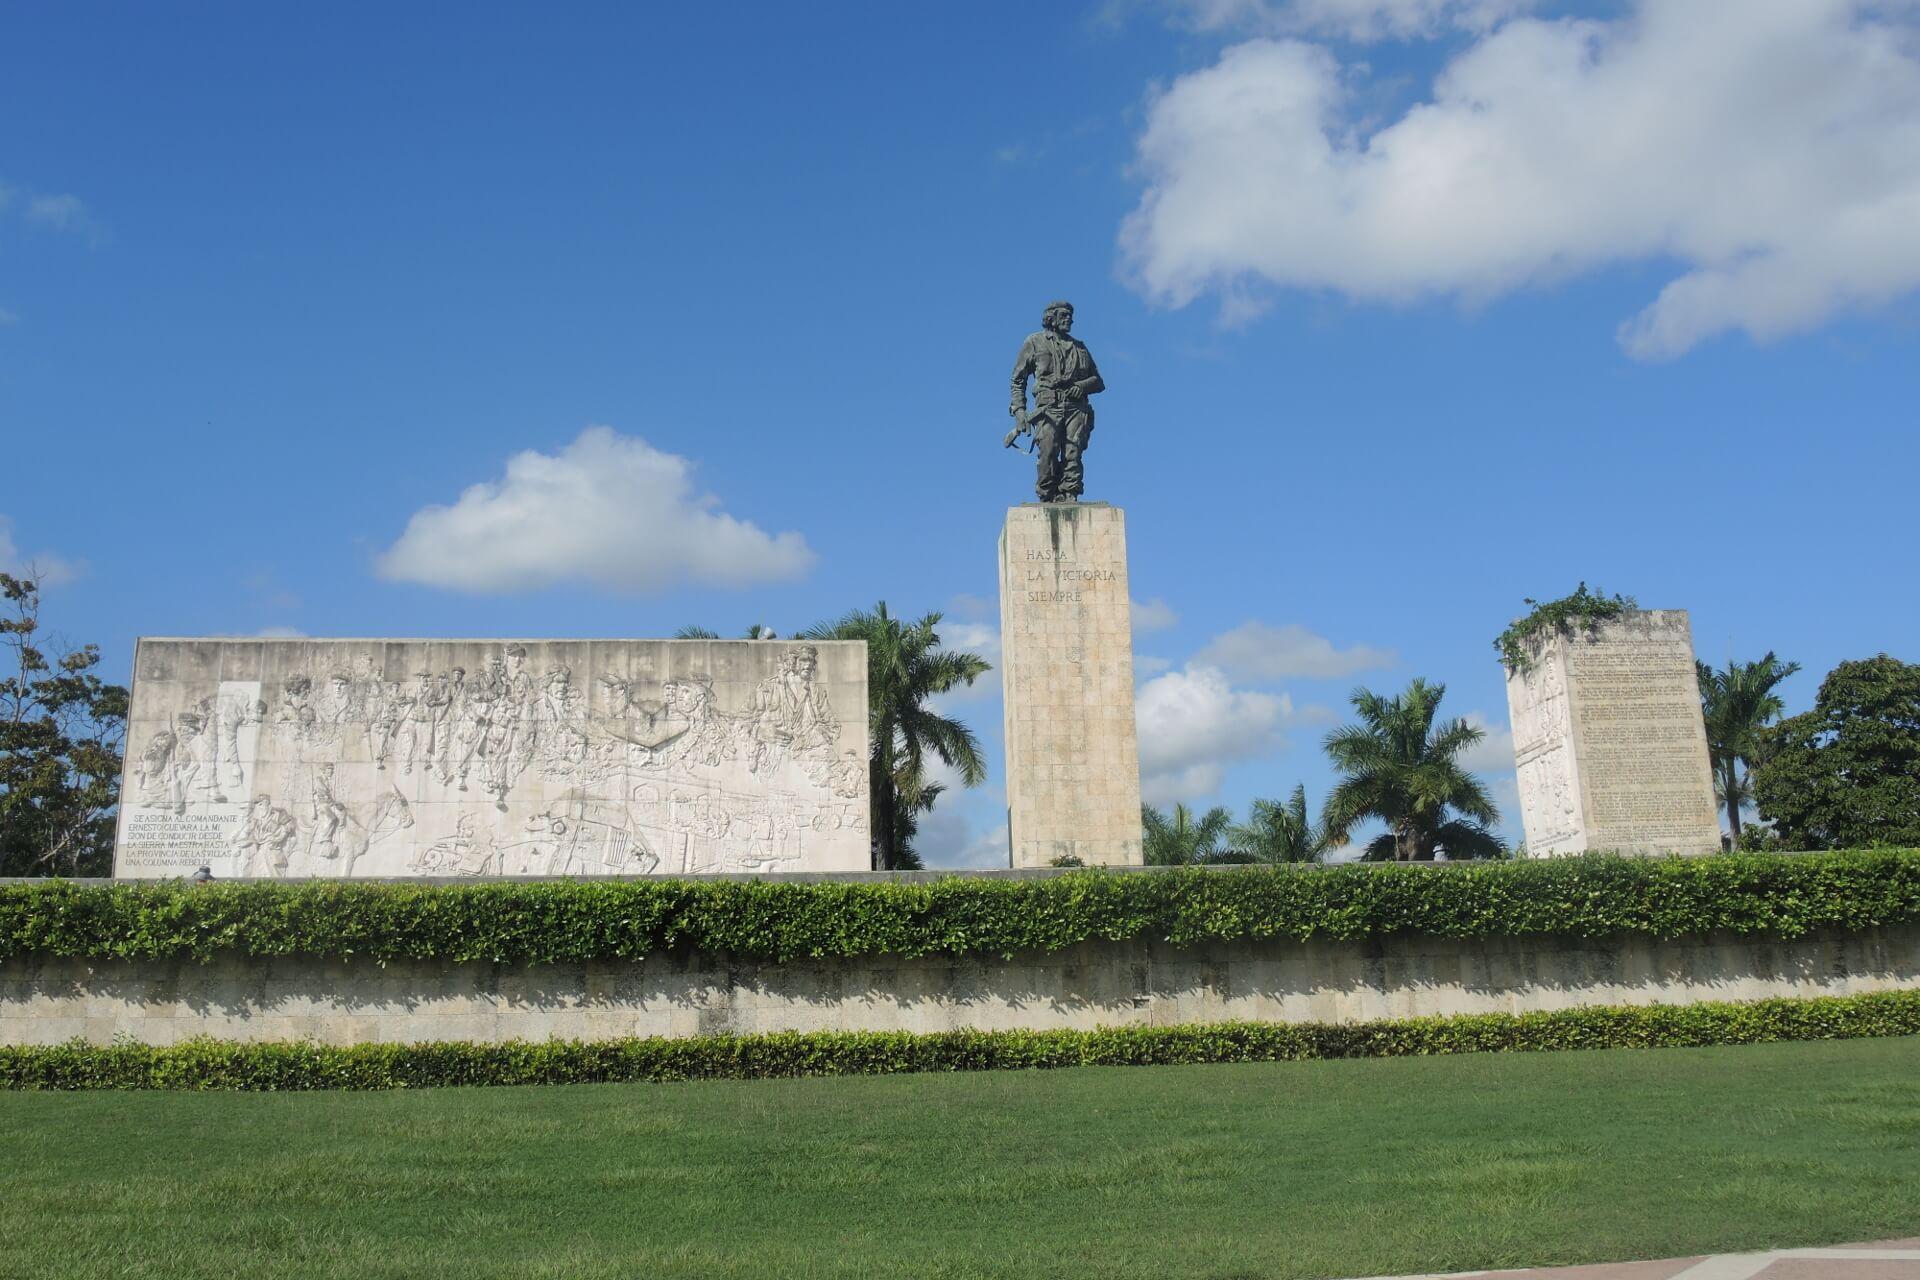 Sehenswürdigkeiten in Kuba Che Guevara Denkmal Santa Clara